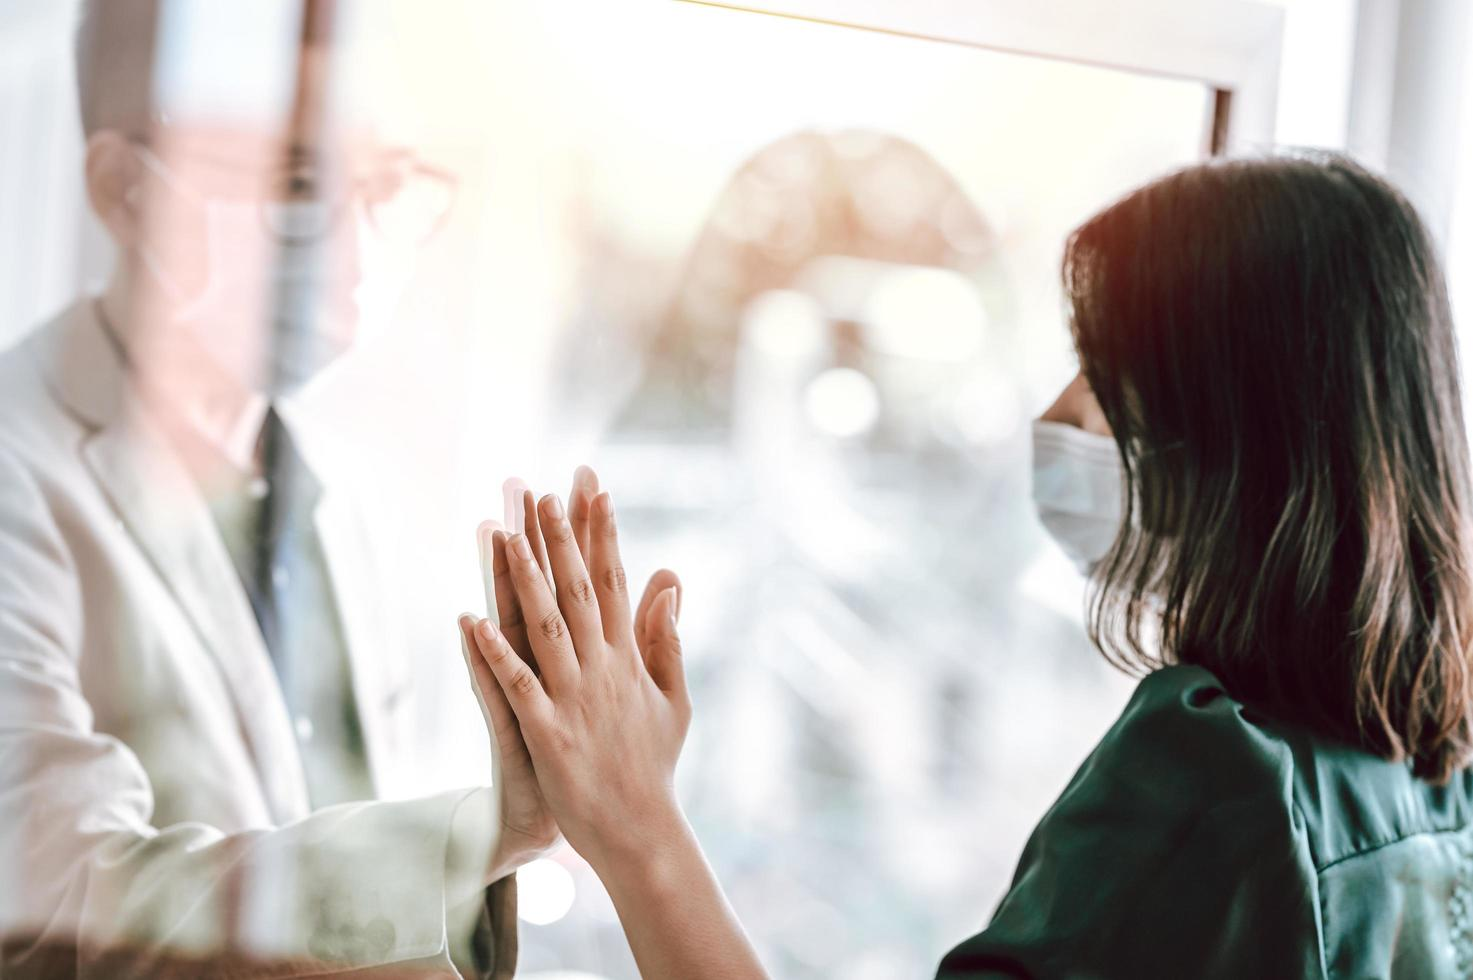 coppia asiatica che indossa una maschera separata a causa di problemi di salute pubblica foto